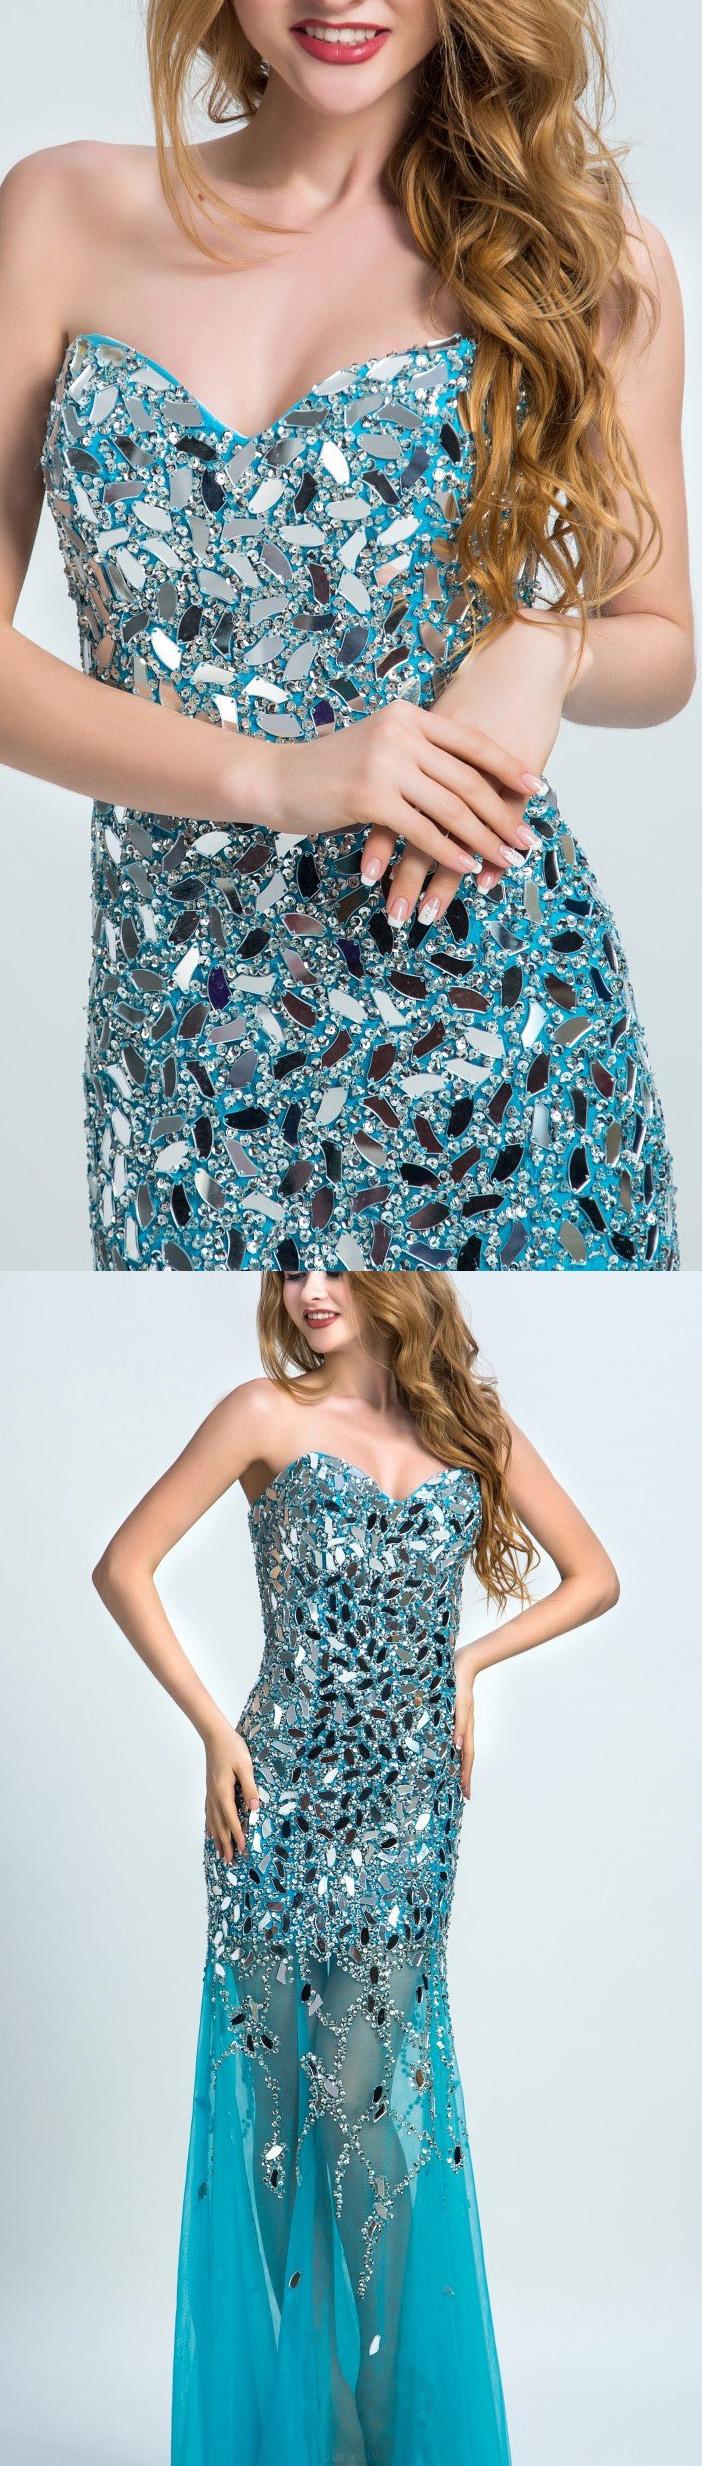 Custom made rhinestone light blue evening prom dresses cute long